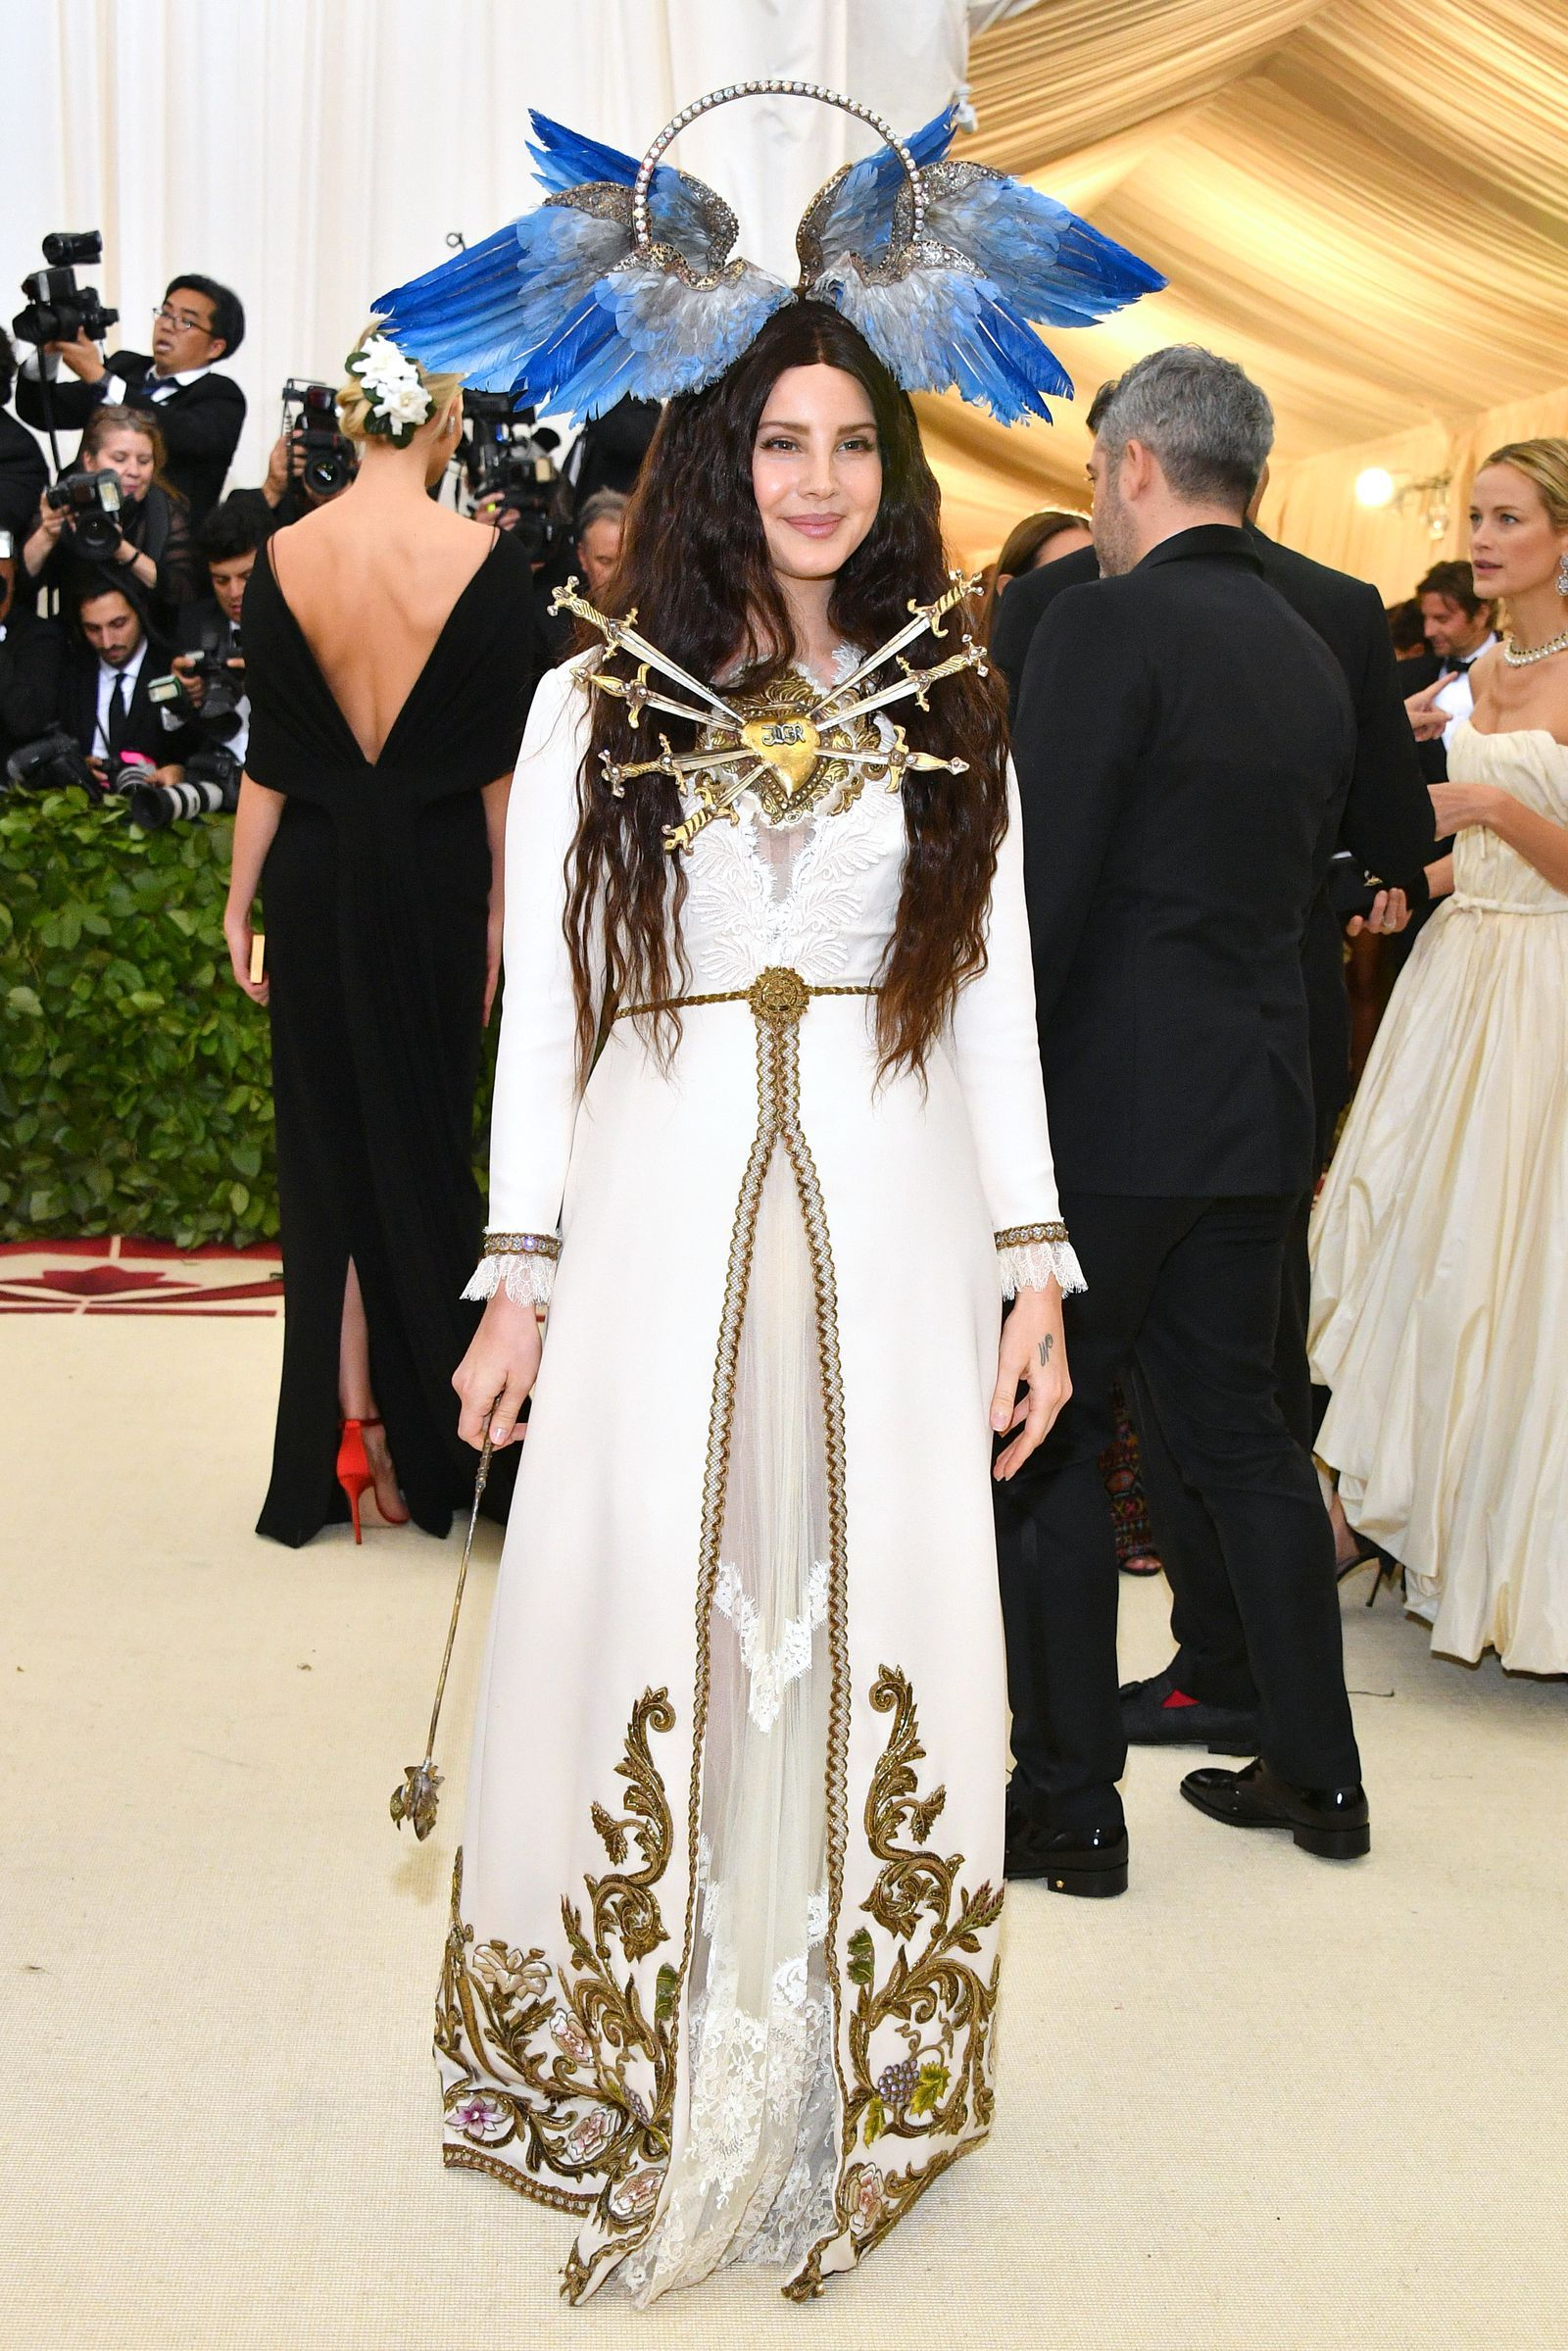 ba6ebb35dd2 Jared Leto Goes Full Jesus at the Met Gala With Lana Del Rey -  Cosmopolitan.com